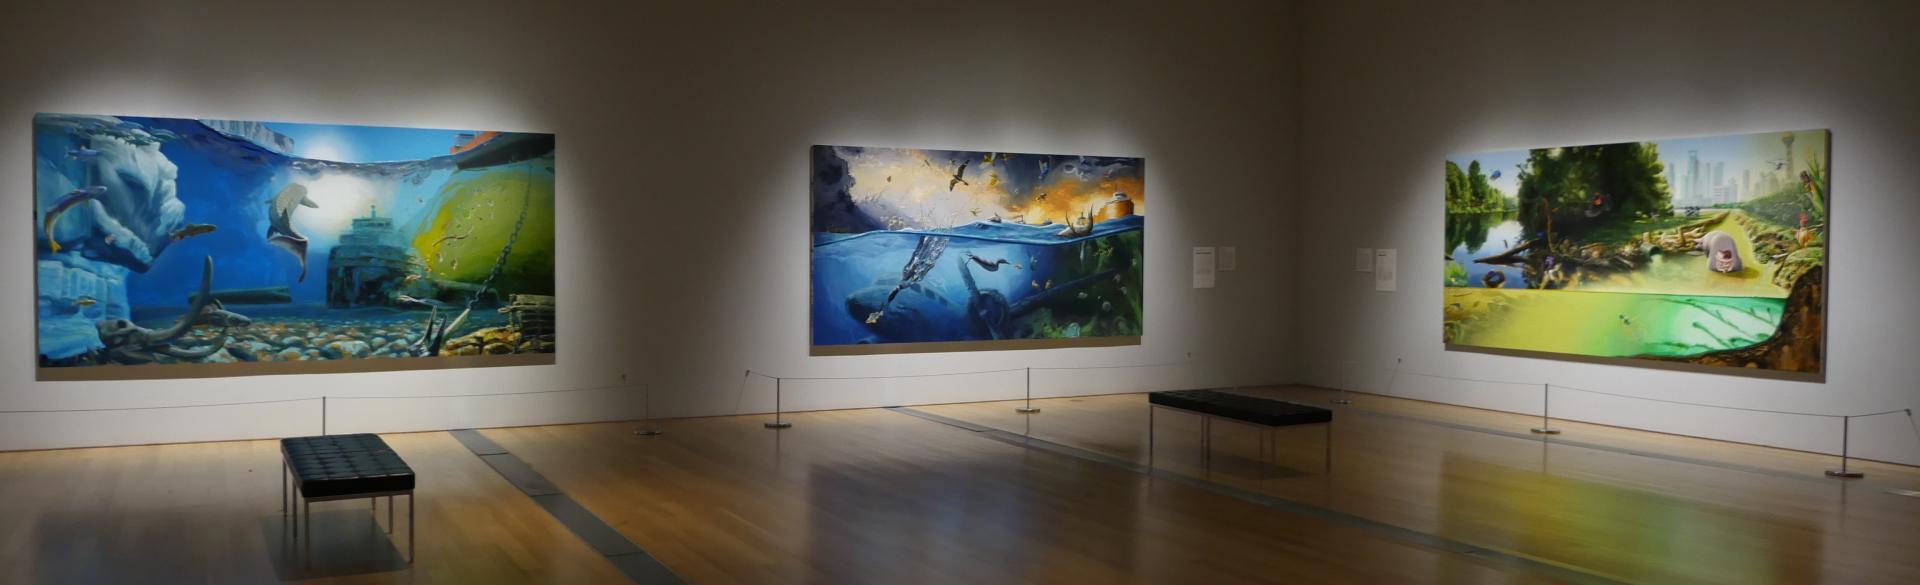 Alexis Rockman exhibit on display at Grand Rapids Art Museum